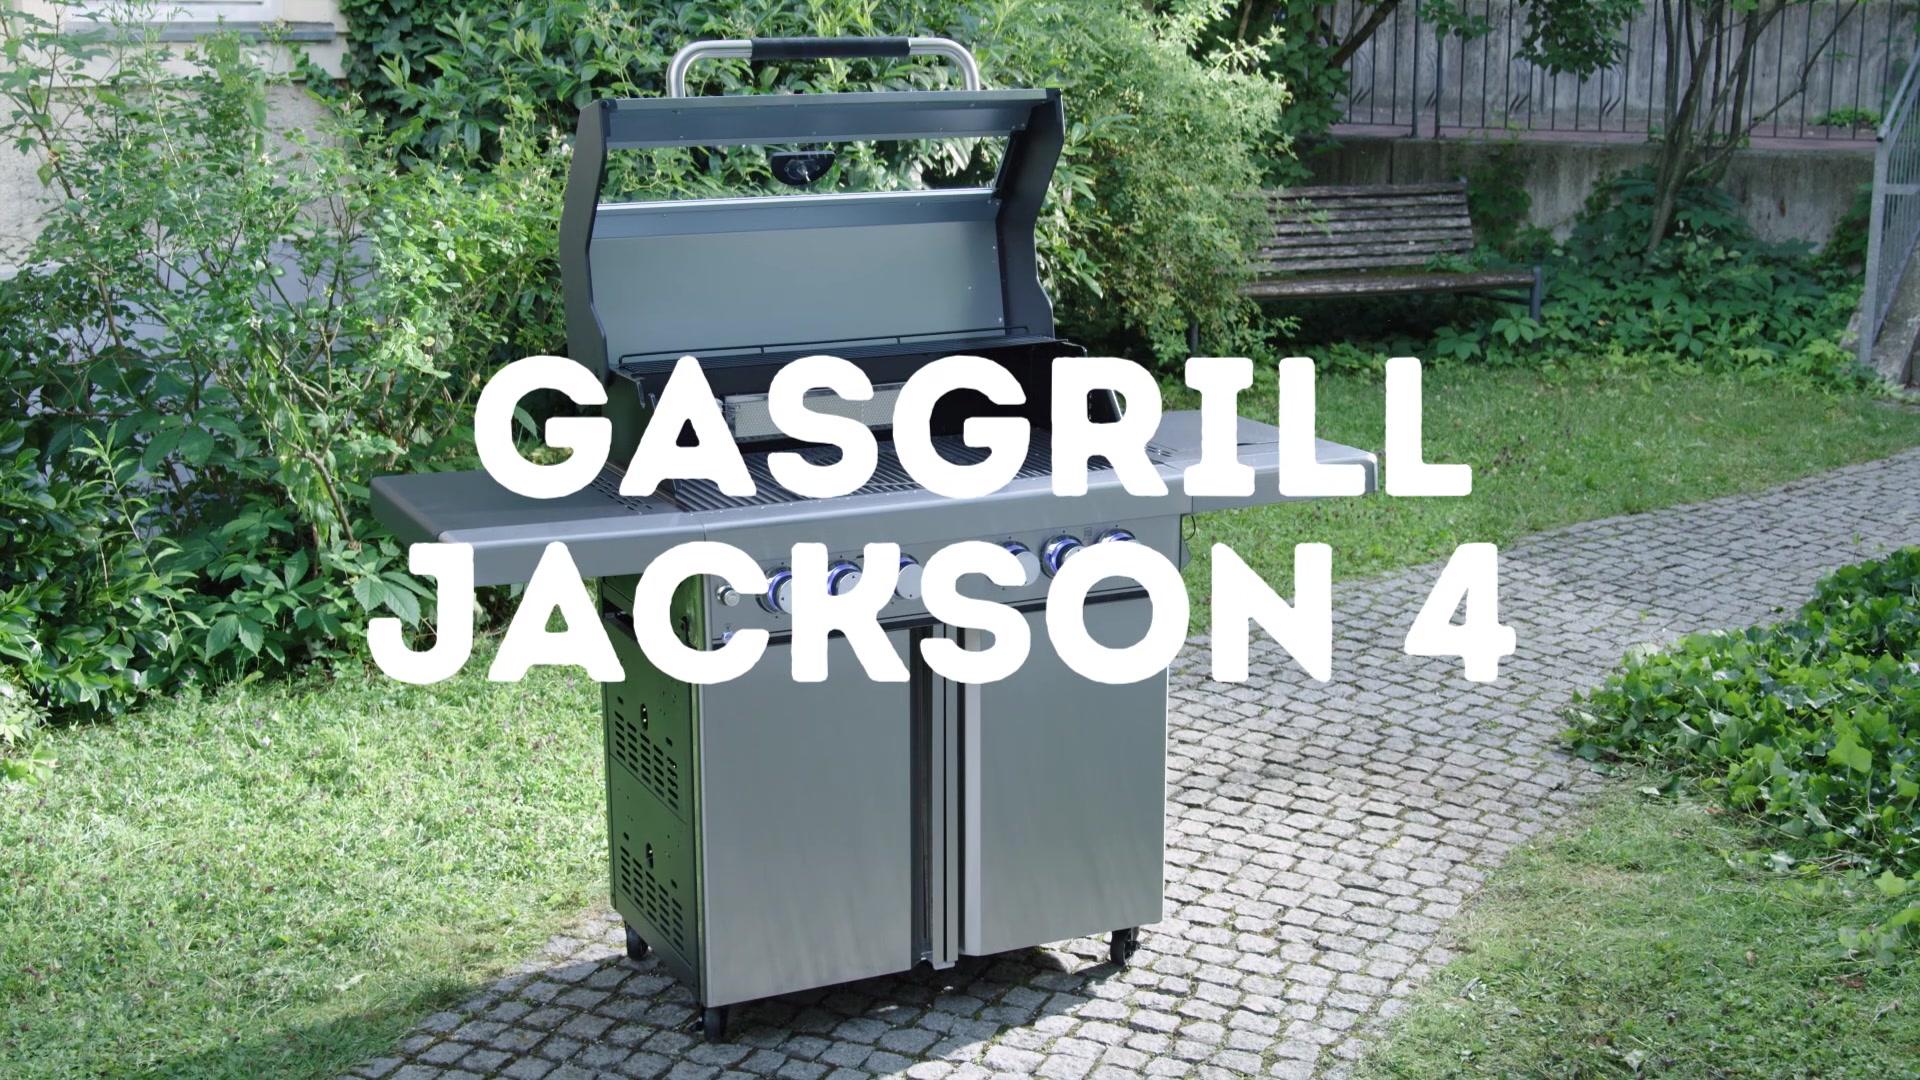 Test Gasgrill Jackson 4 : Mr gardener gasgrill jackson « brenner hagebau